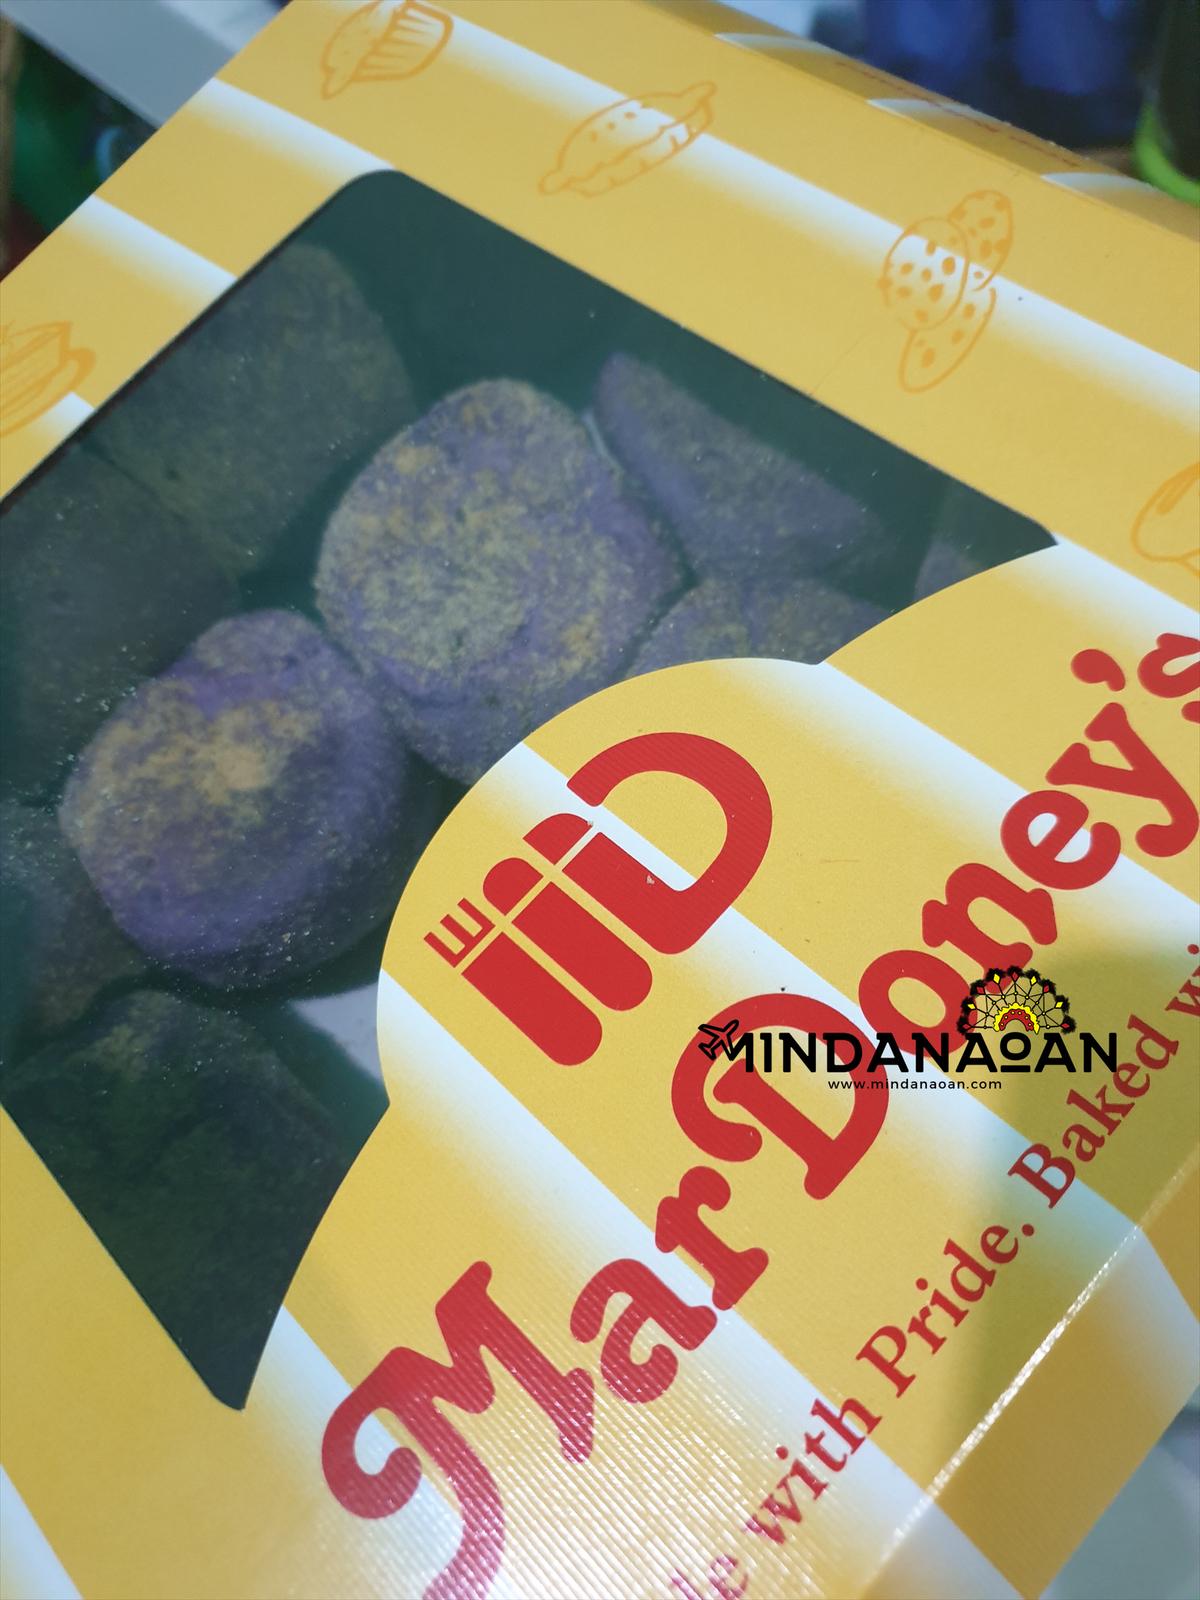 Try Mardoney's Bakeshop CDO ube cheese pandesal